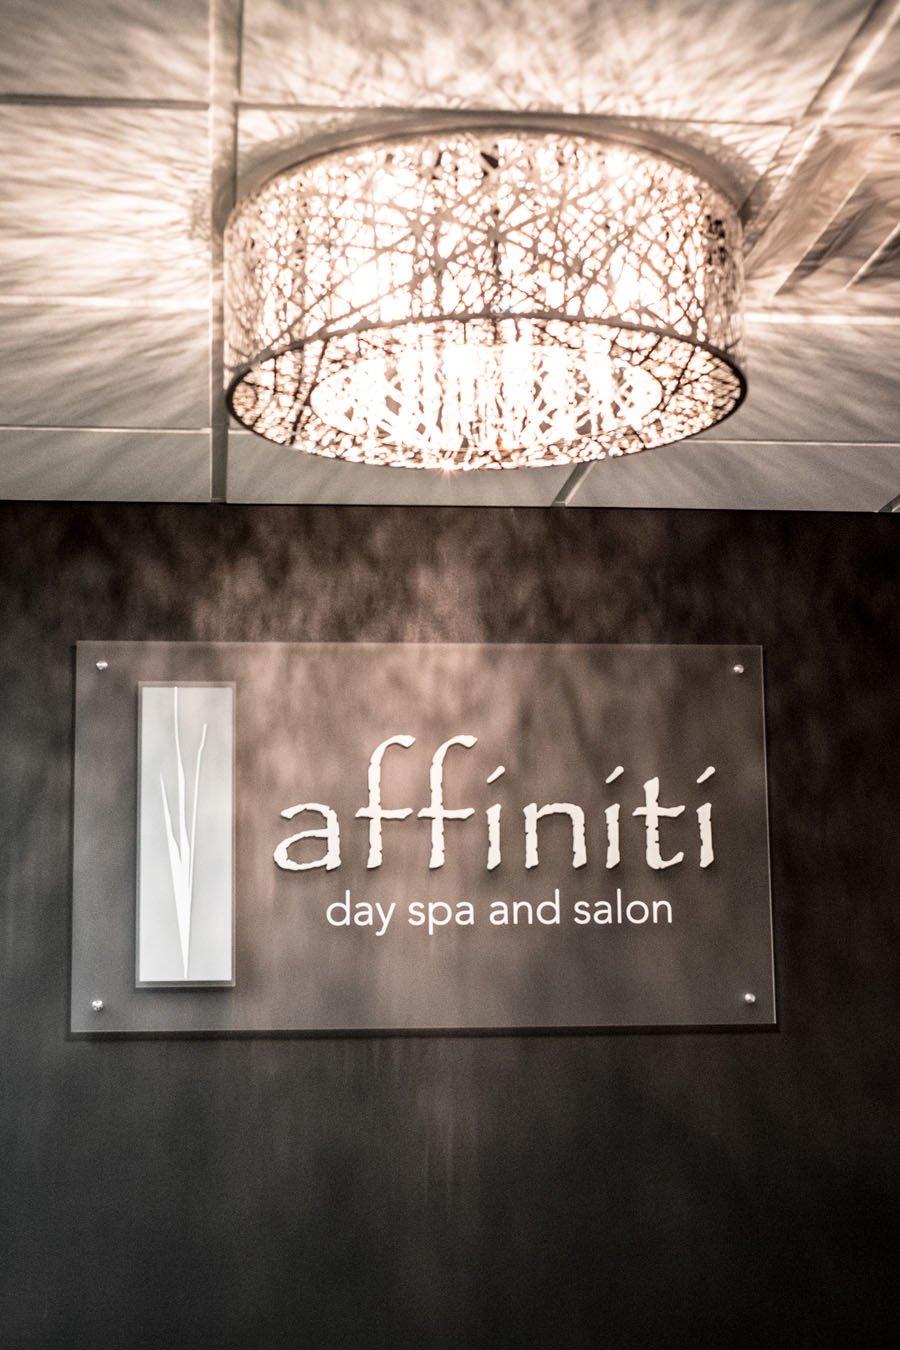 Affiniti day spa and salon